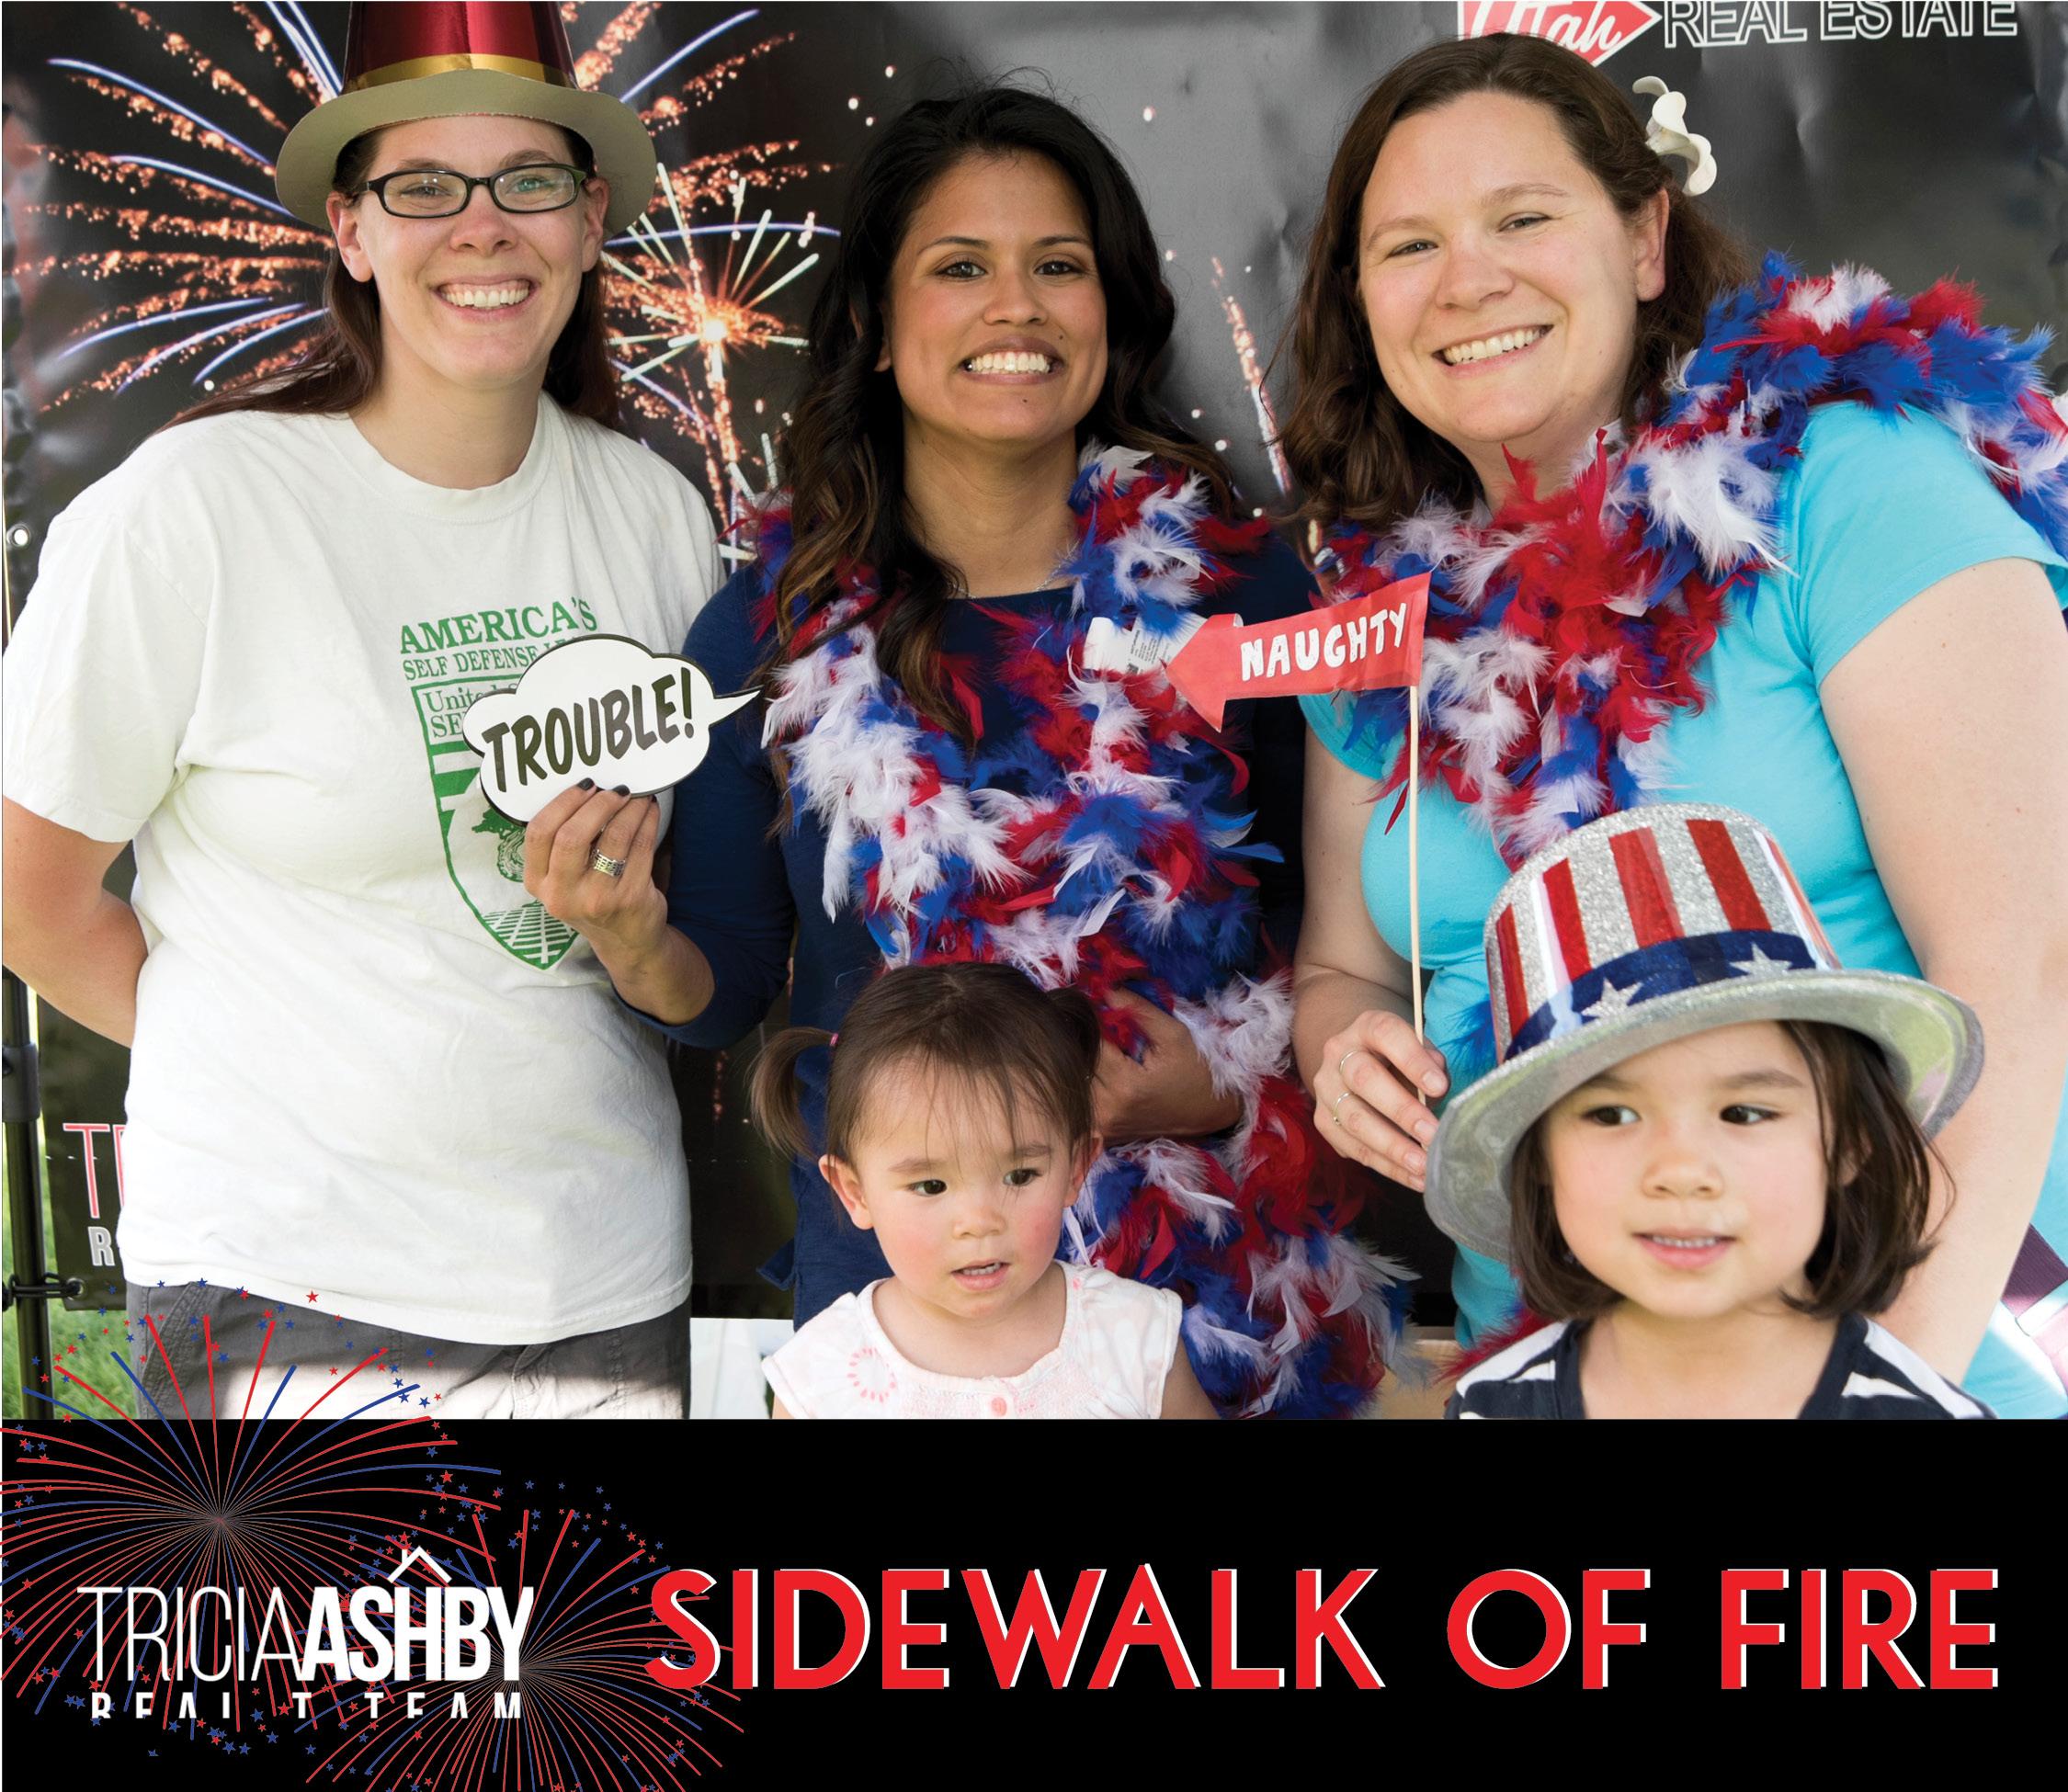 Sidewalk of Fire Pics11